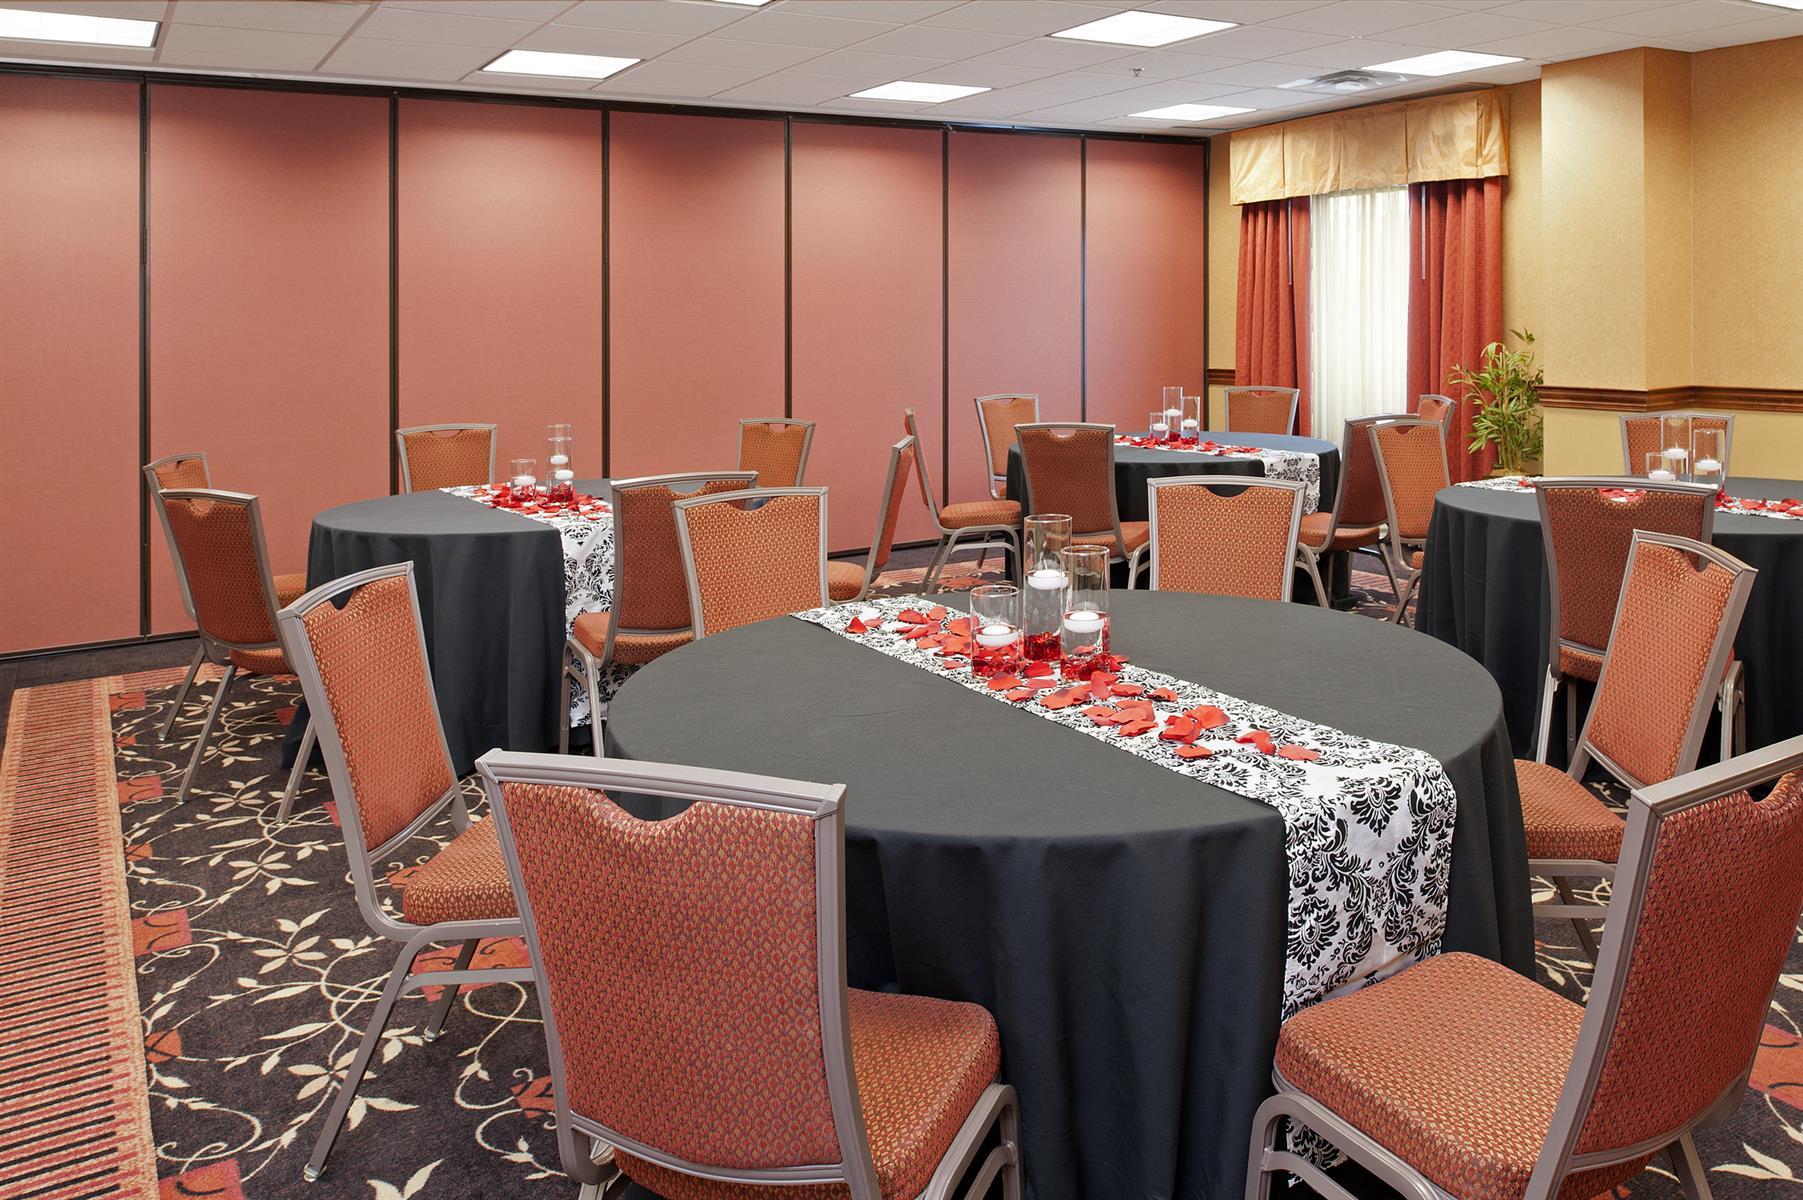 Hampton Inn & Suites Columbus/Easton Area - Cardinal Room